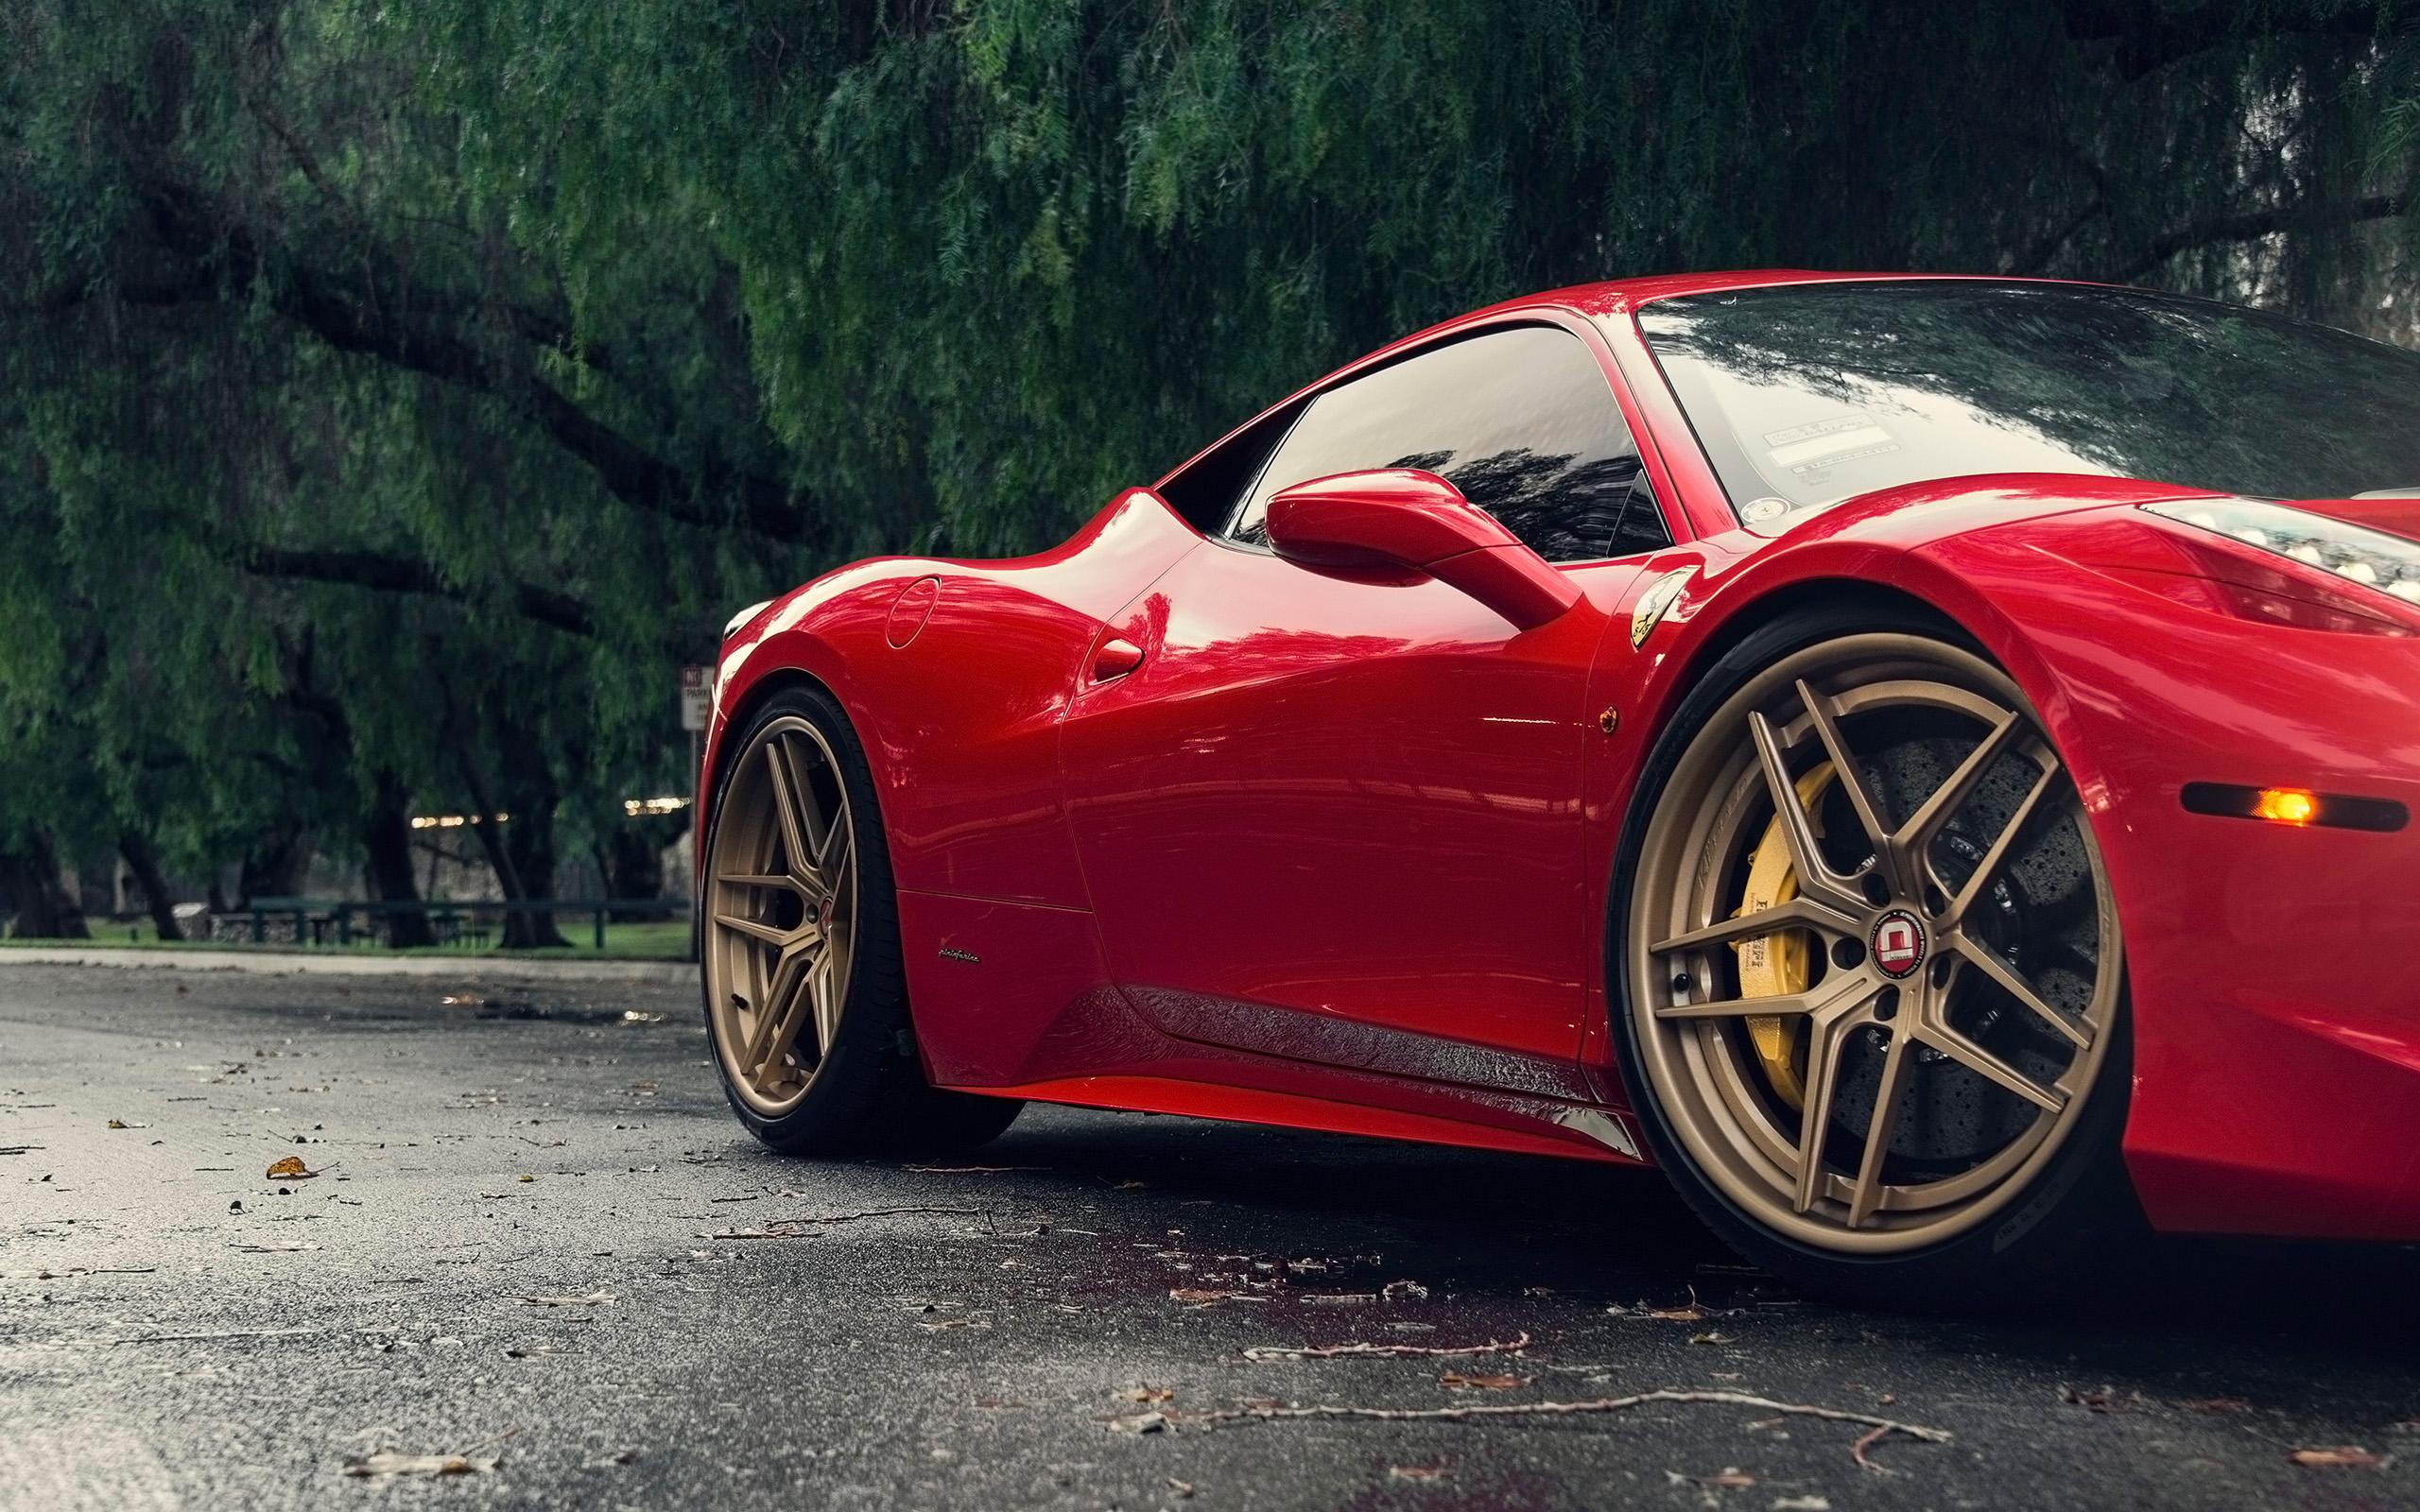 30 2016 Ferrari 458 Italia Wallpaper On Wallpapersafari